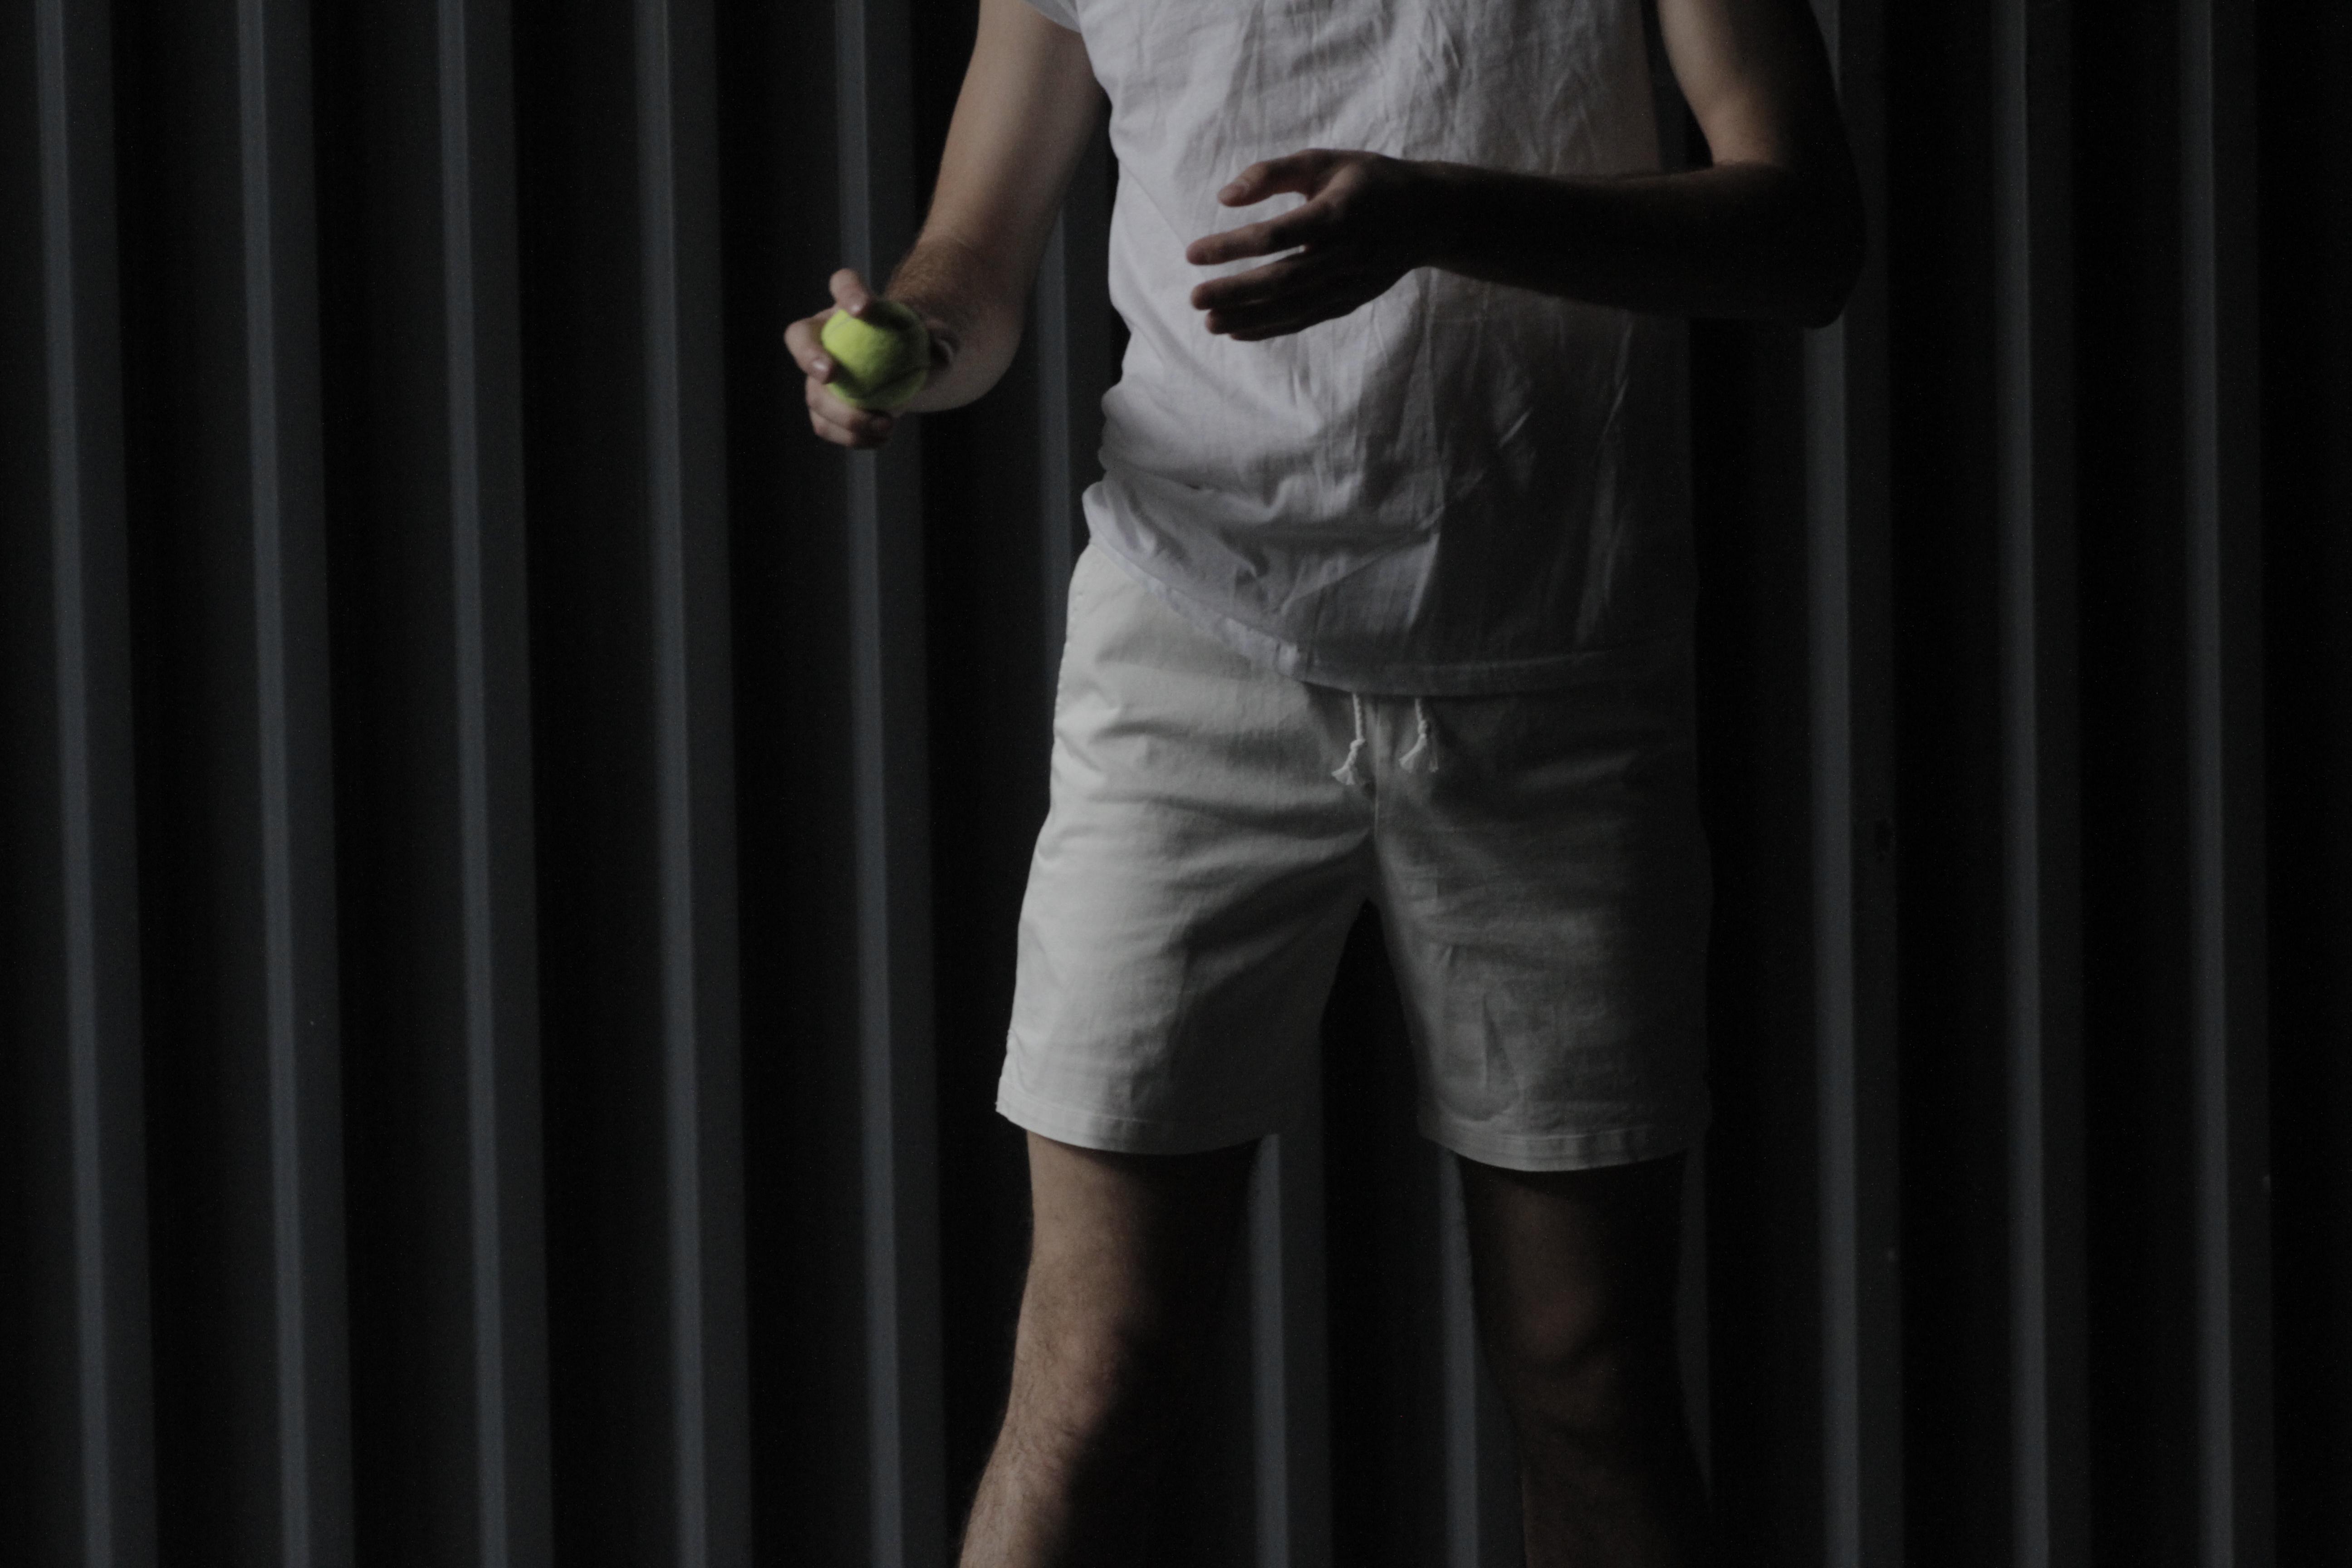 TENNIS - SHORT FILM ('14)